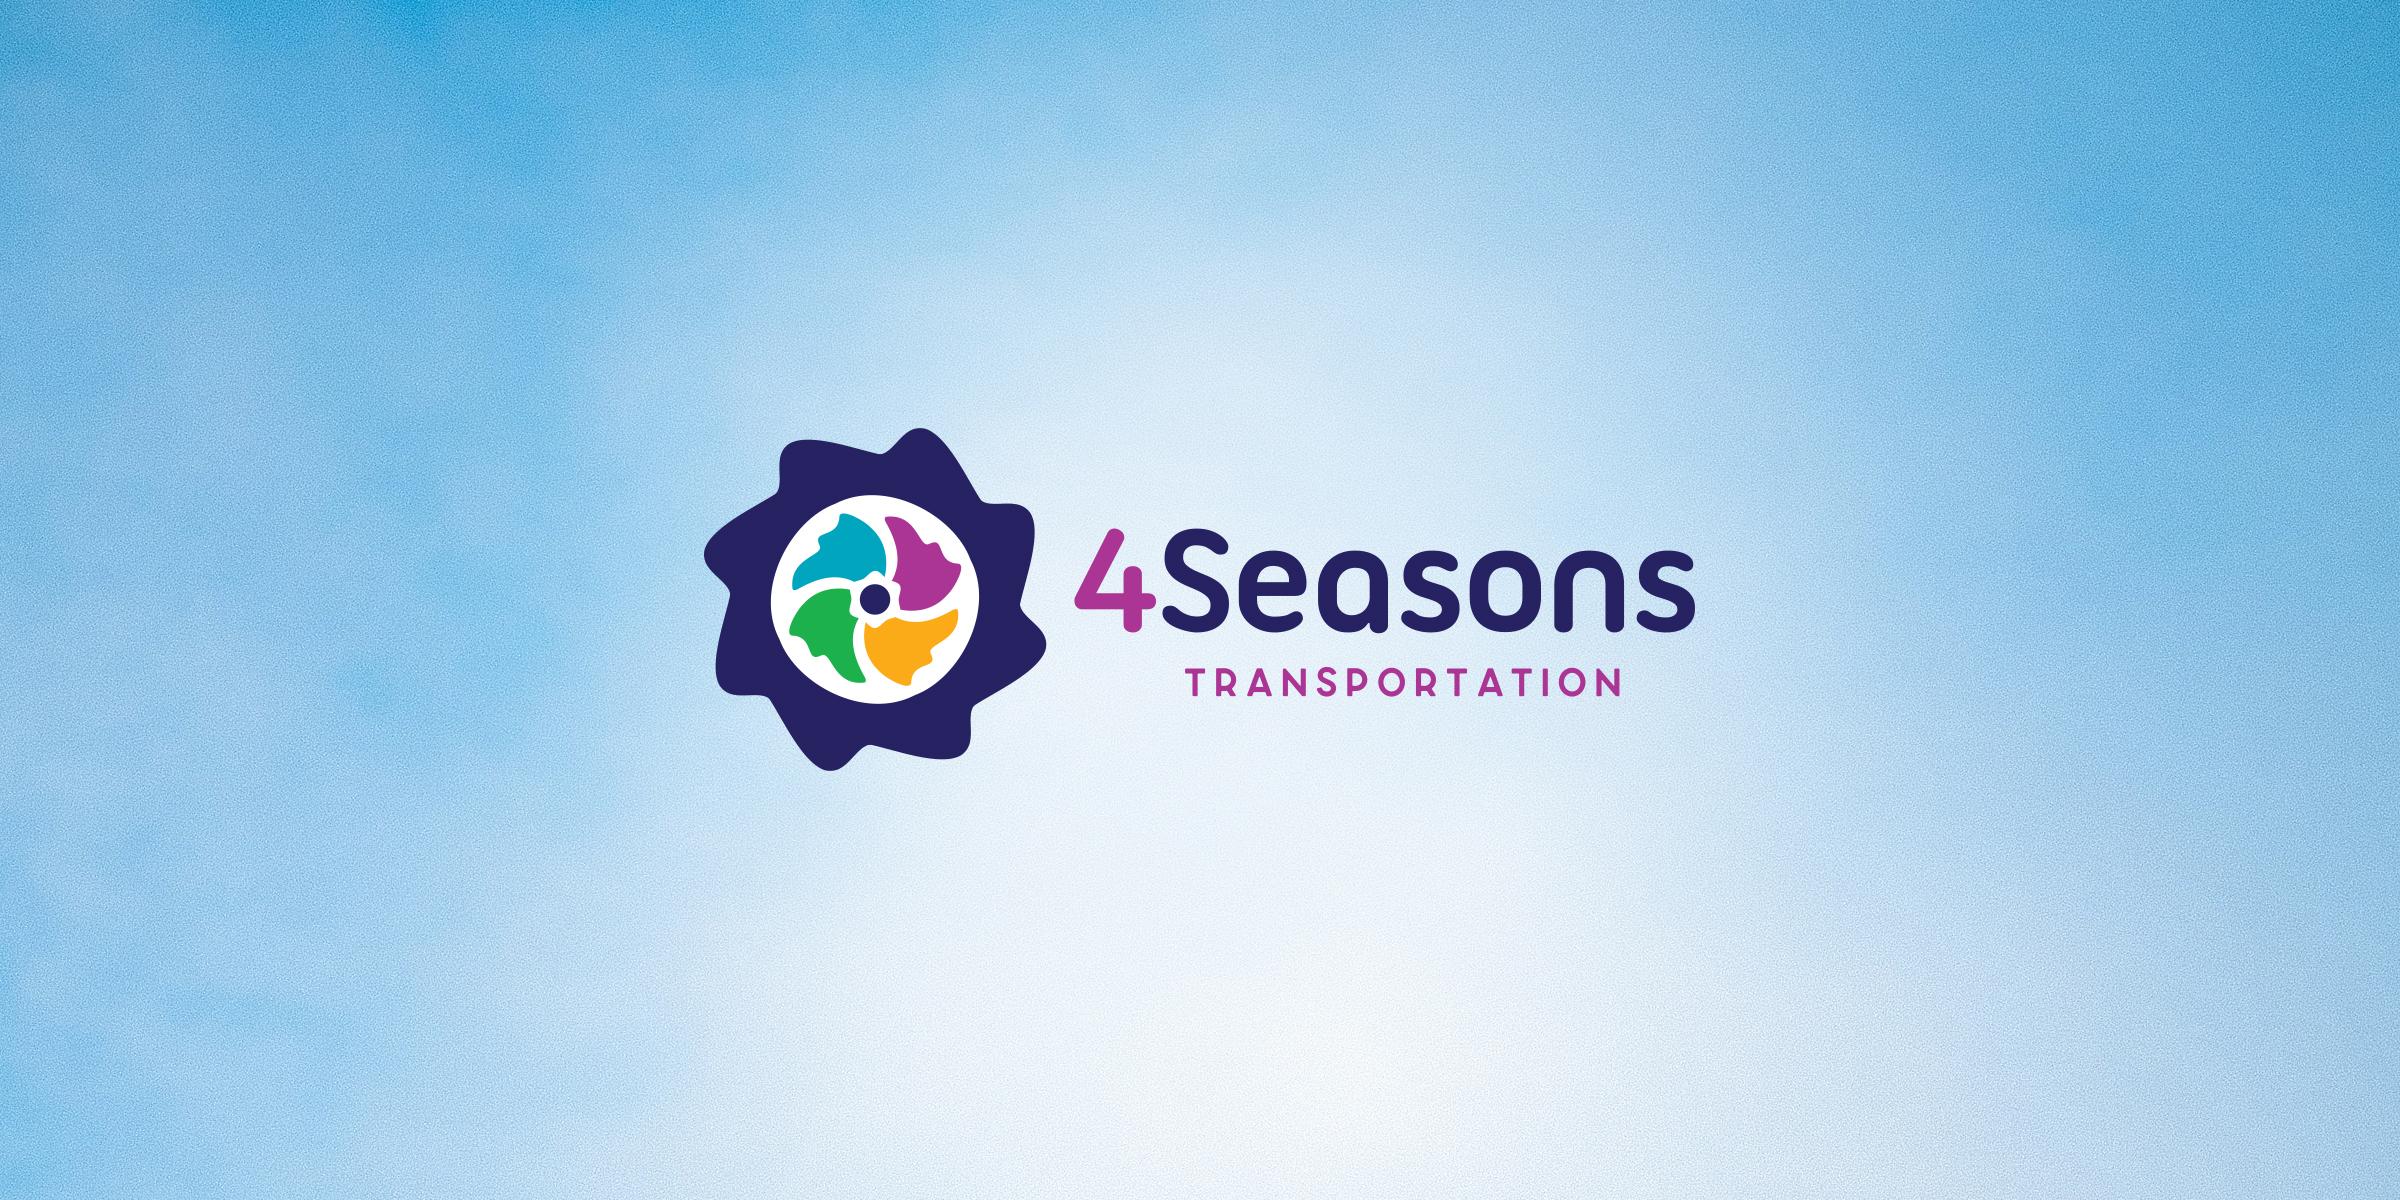 4 Seasons Transportation Logo design